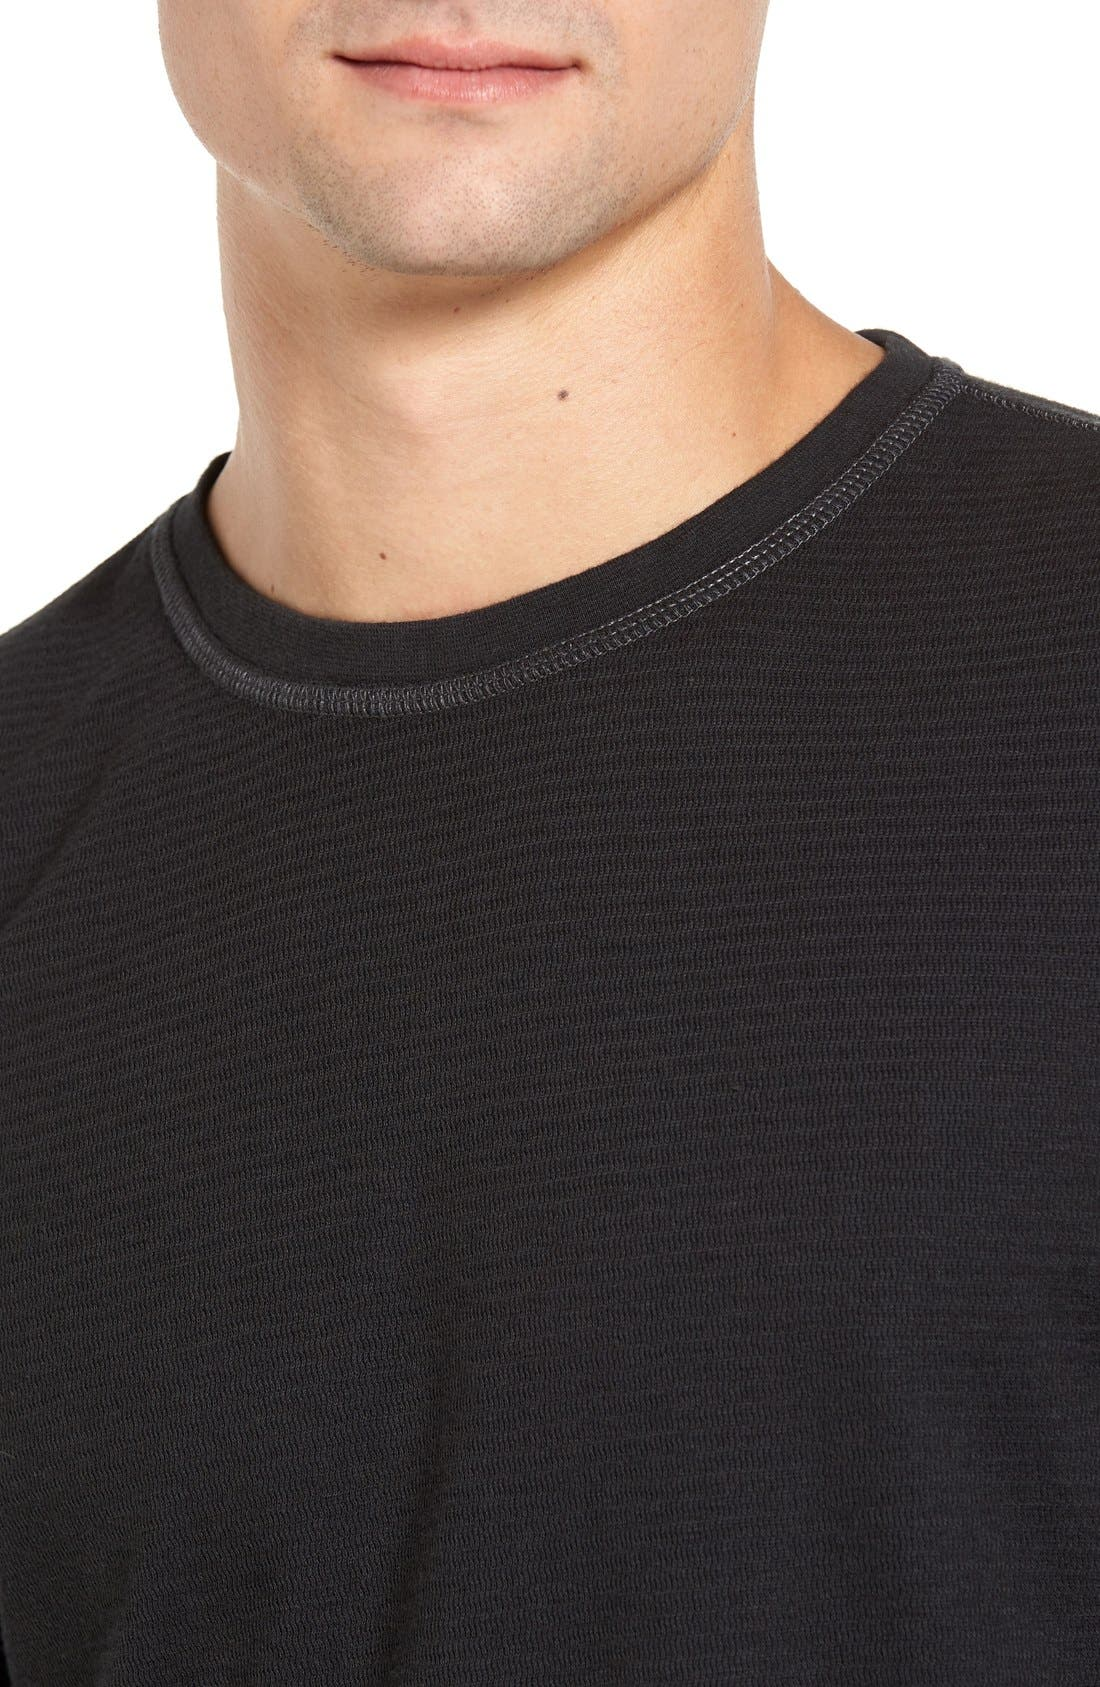 Larsen Zigzag Thermal T-Shirt,                             Alternate thumbnail 13, color,